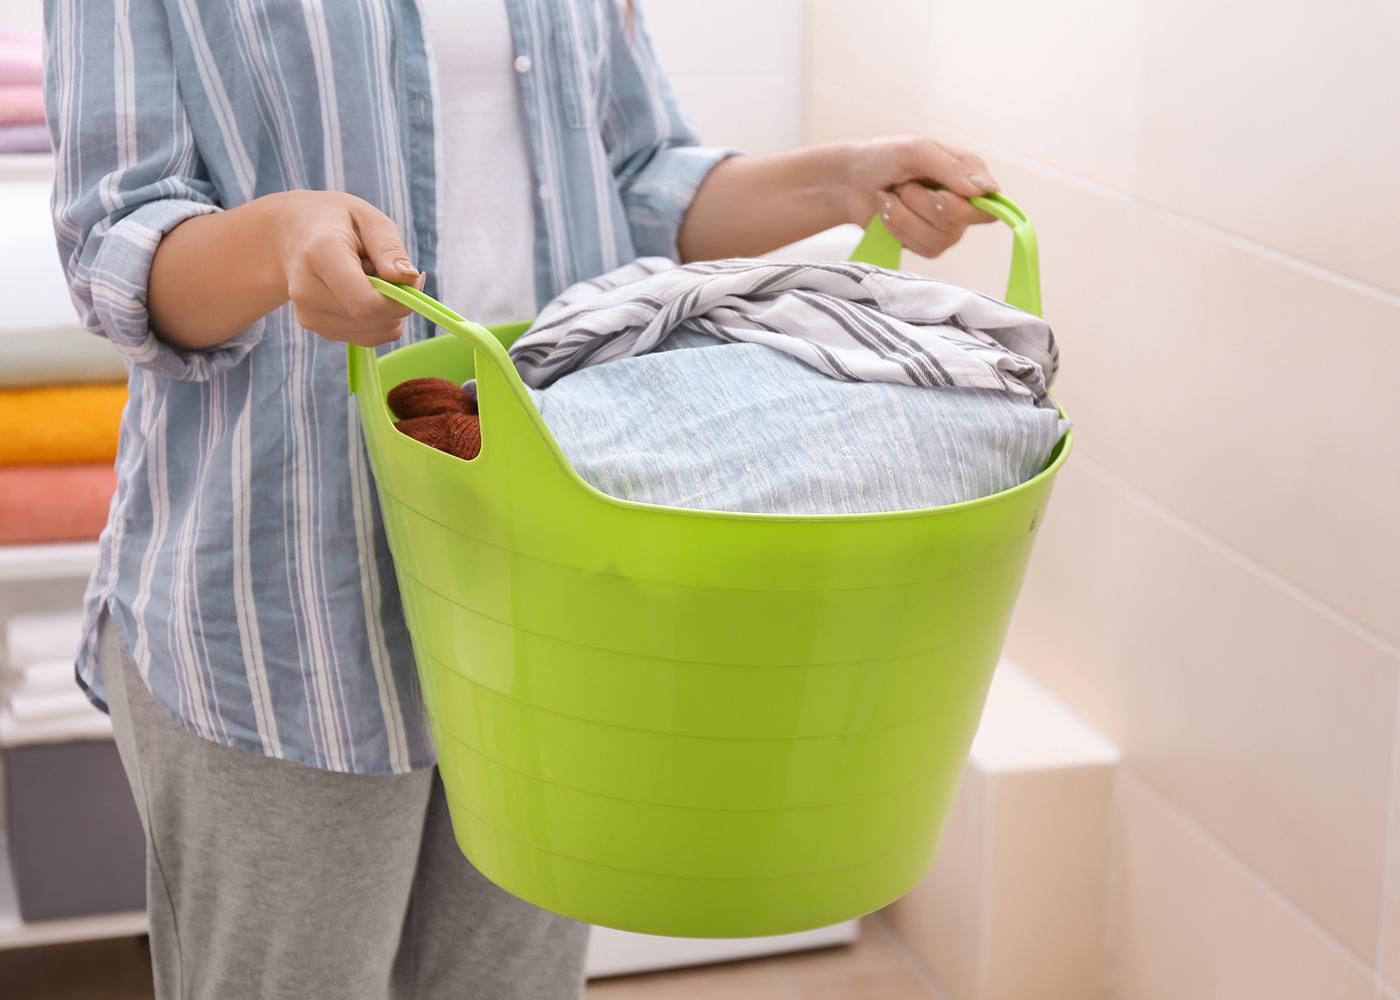 colocar roupa a lavar